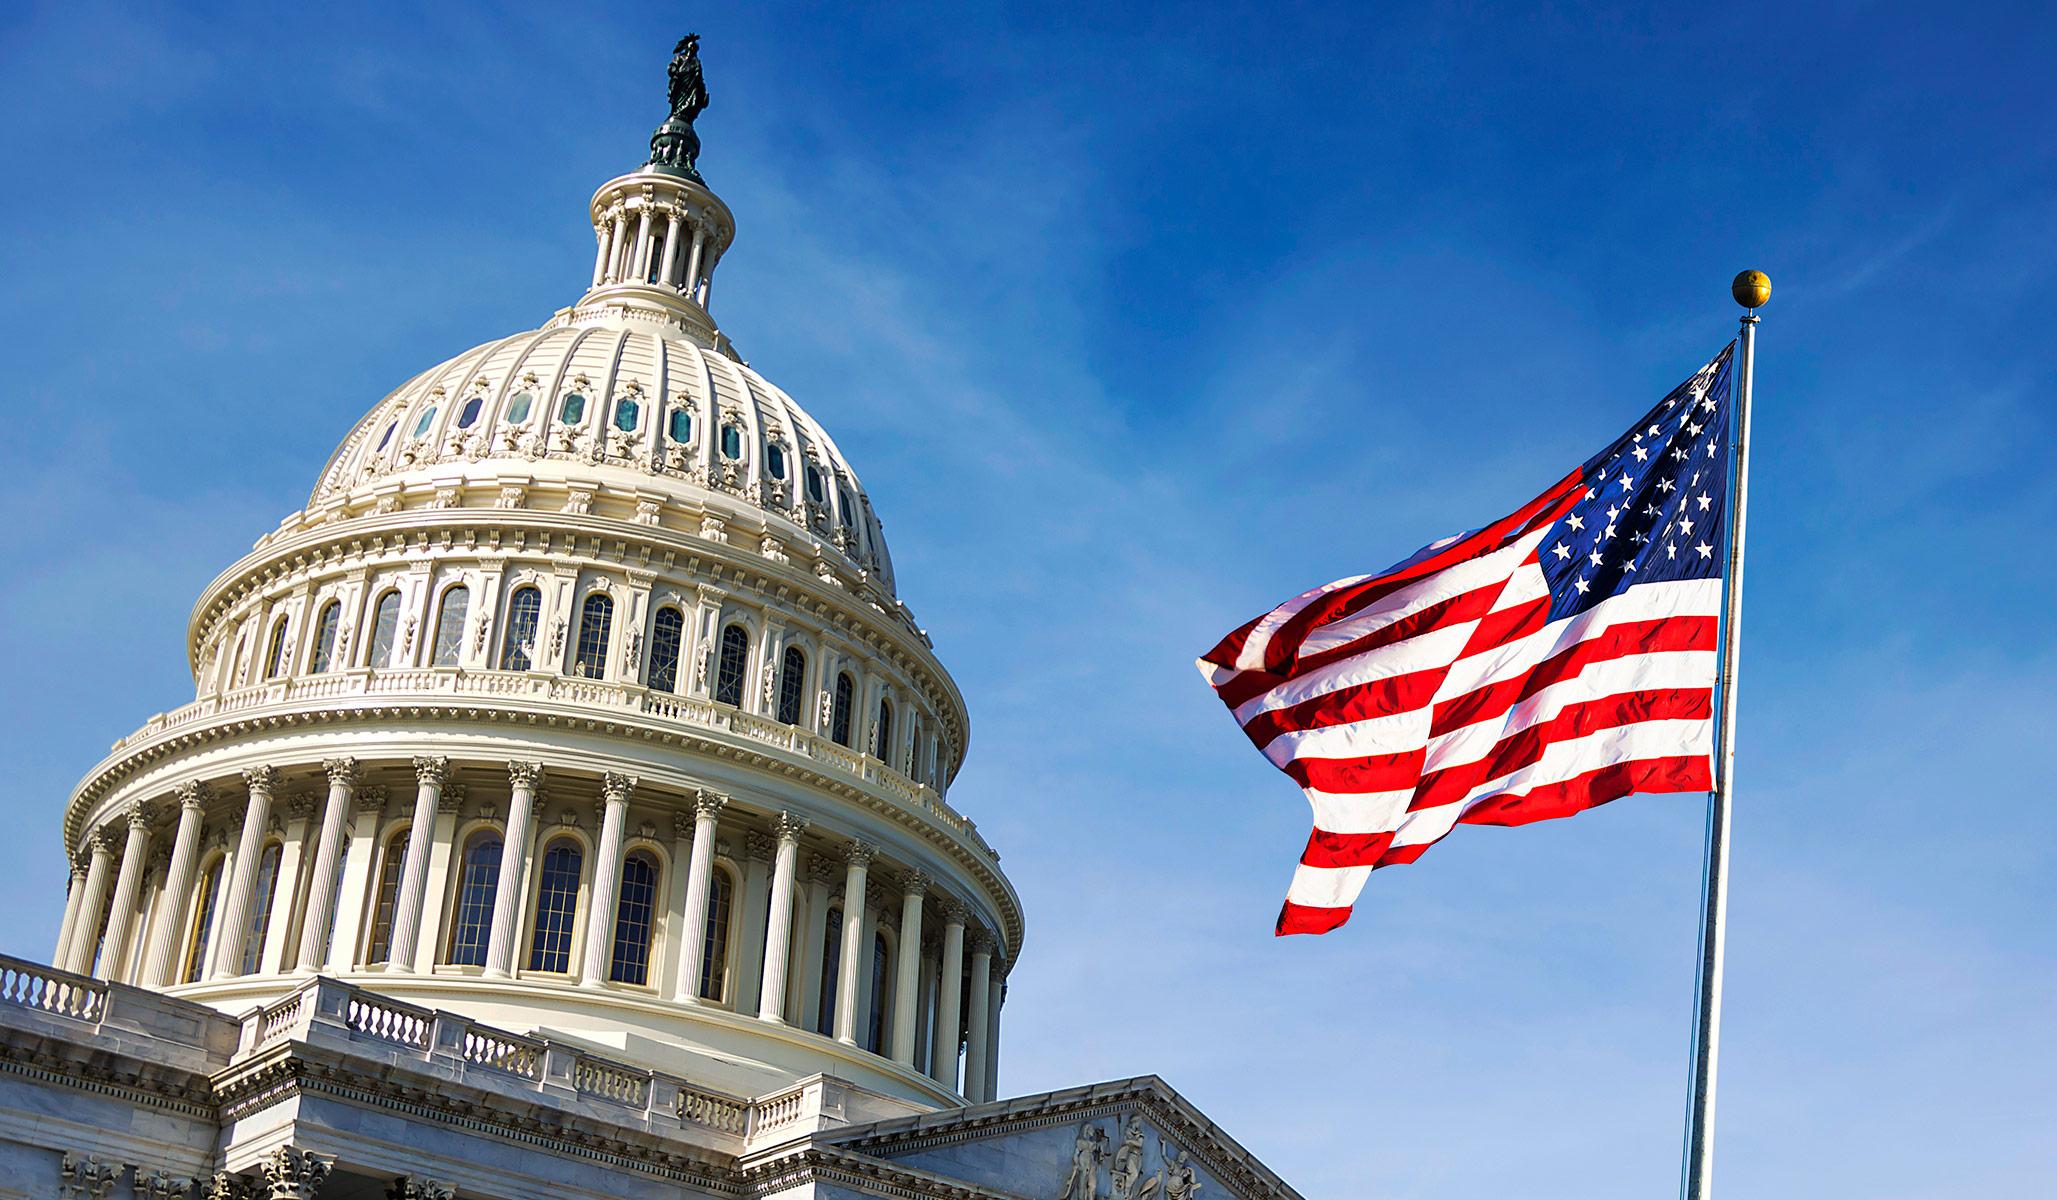 Senate Votes to Advance $1 Trillion Bipartisan Infrastructure Proposal